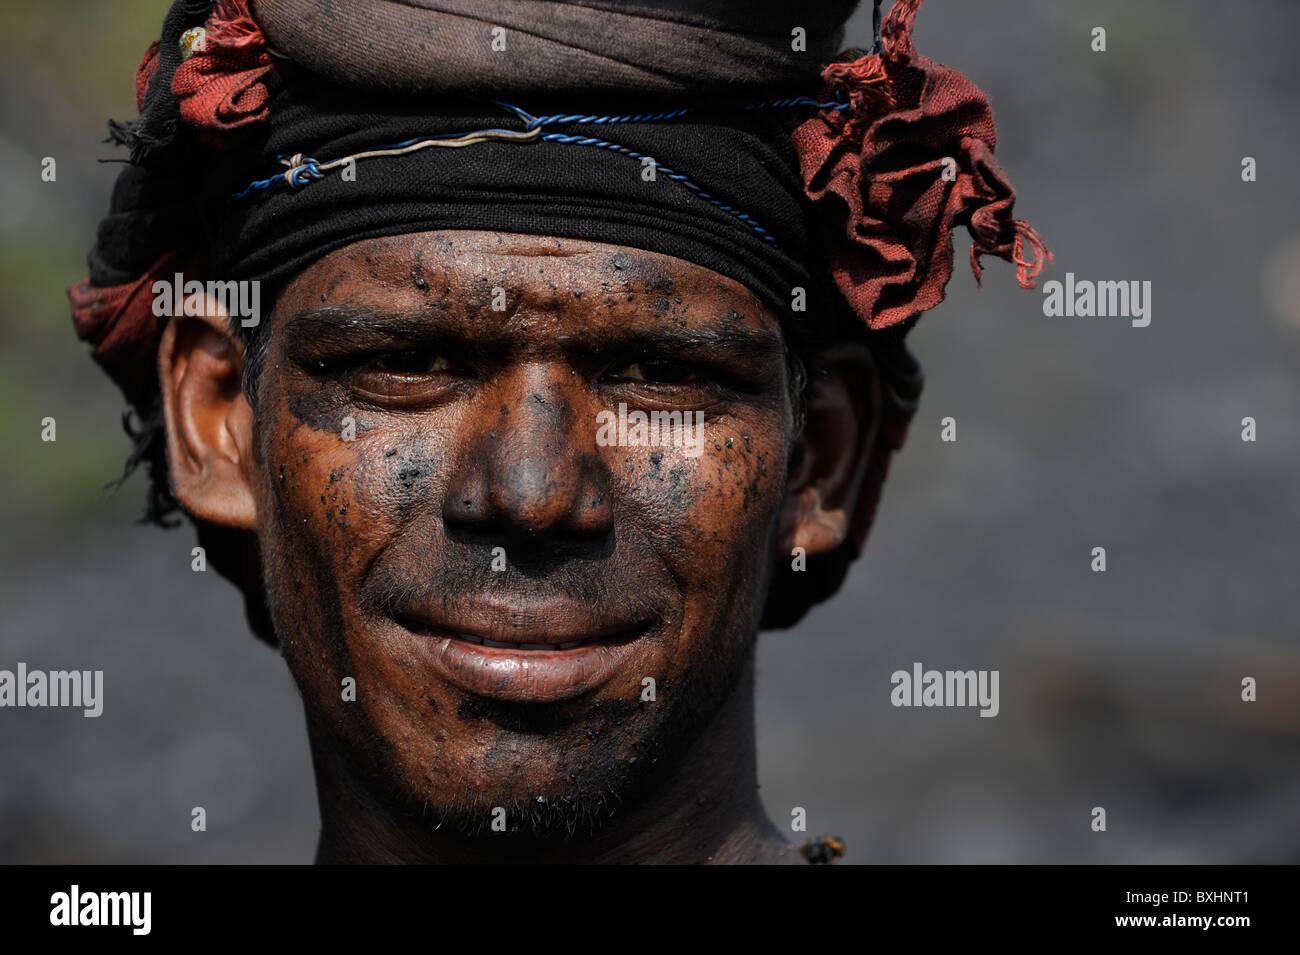 India Jharkhand Dhanbad , coal mining of Bharat coking coal Ltd. - Stock Image